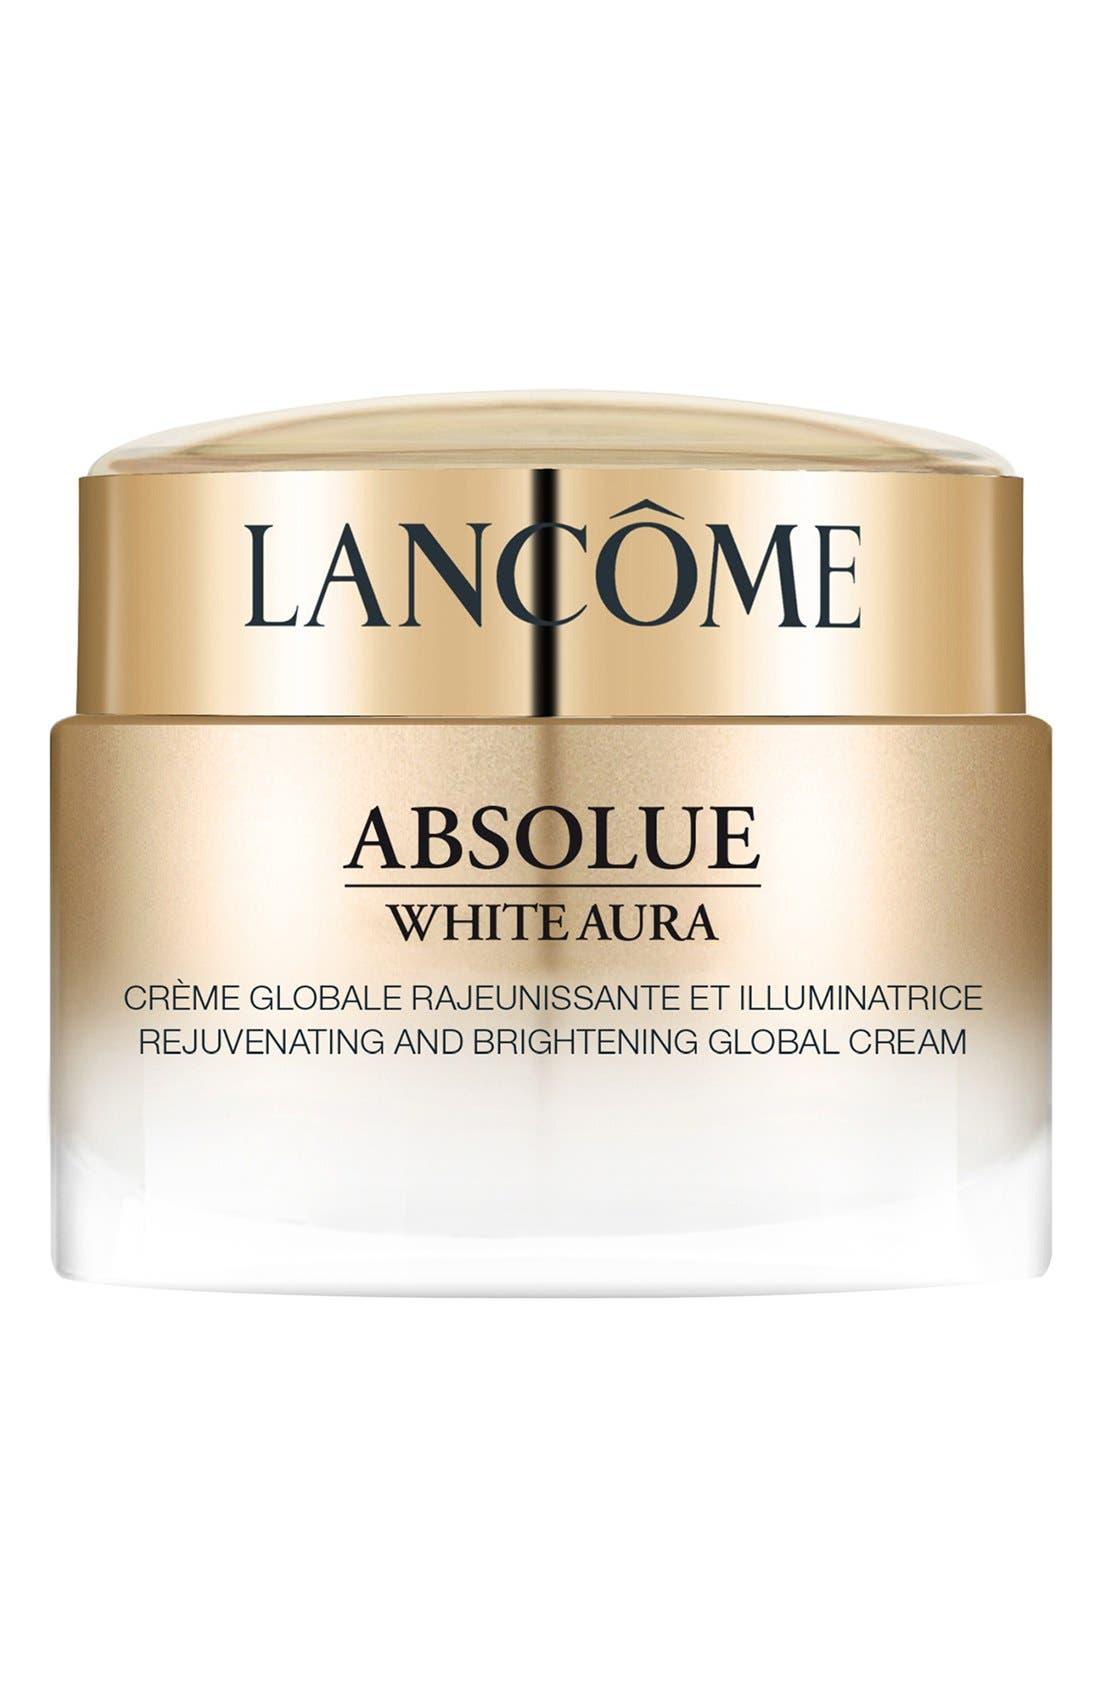 Lancome Absolue White Aura Rejuvenating And Brightening Global Cream